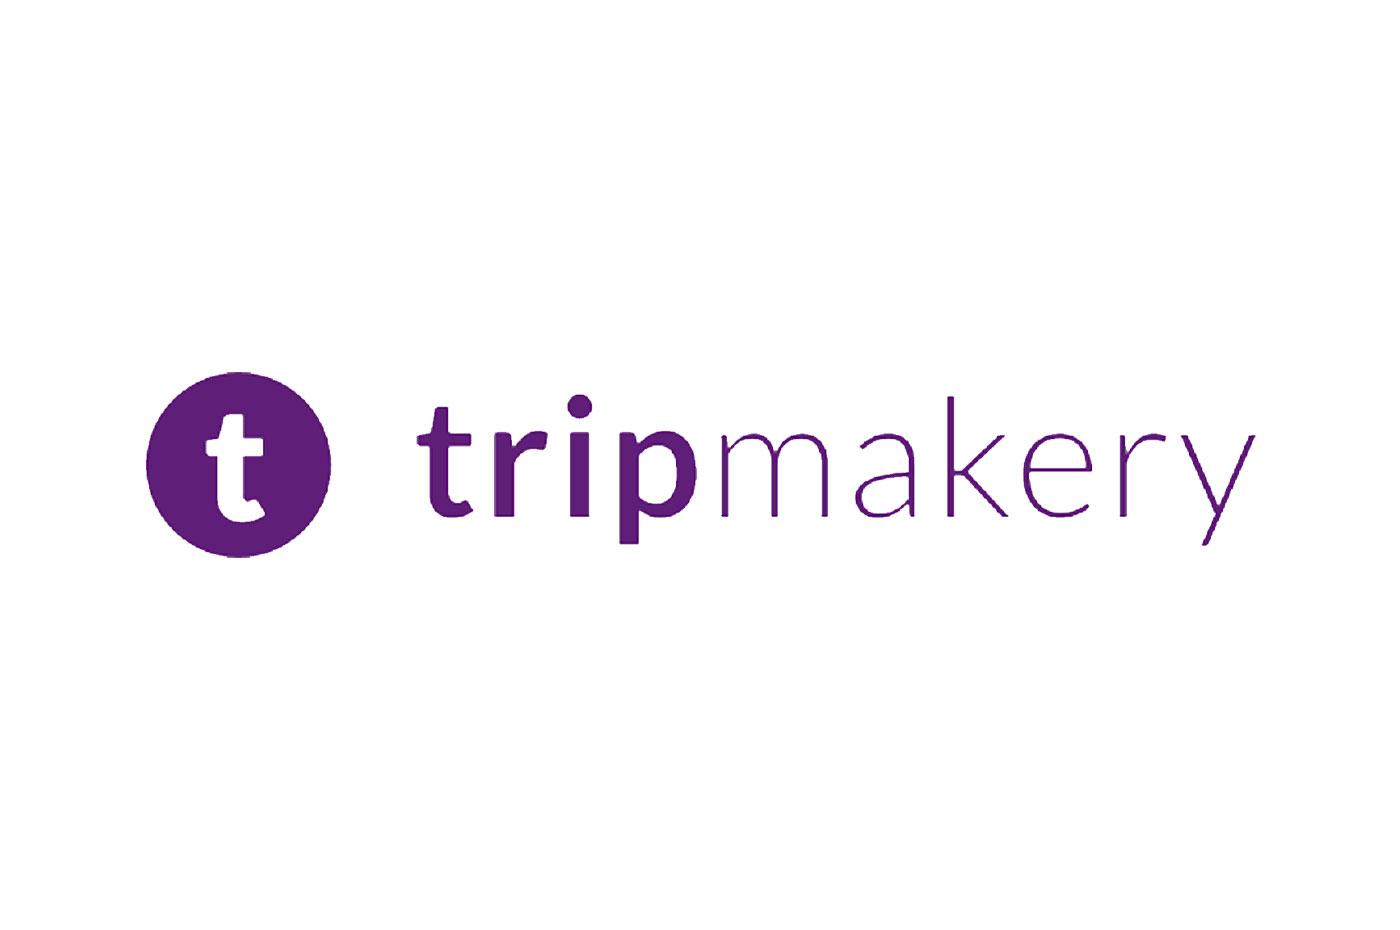 Tripmakery